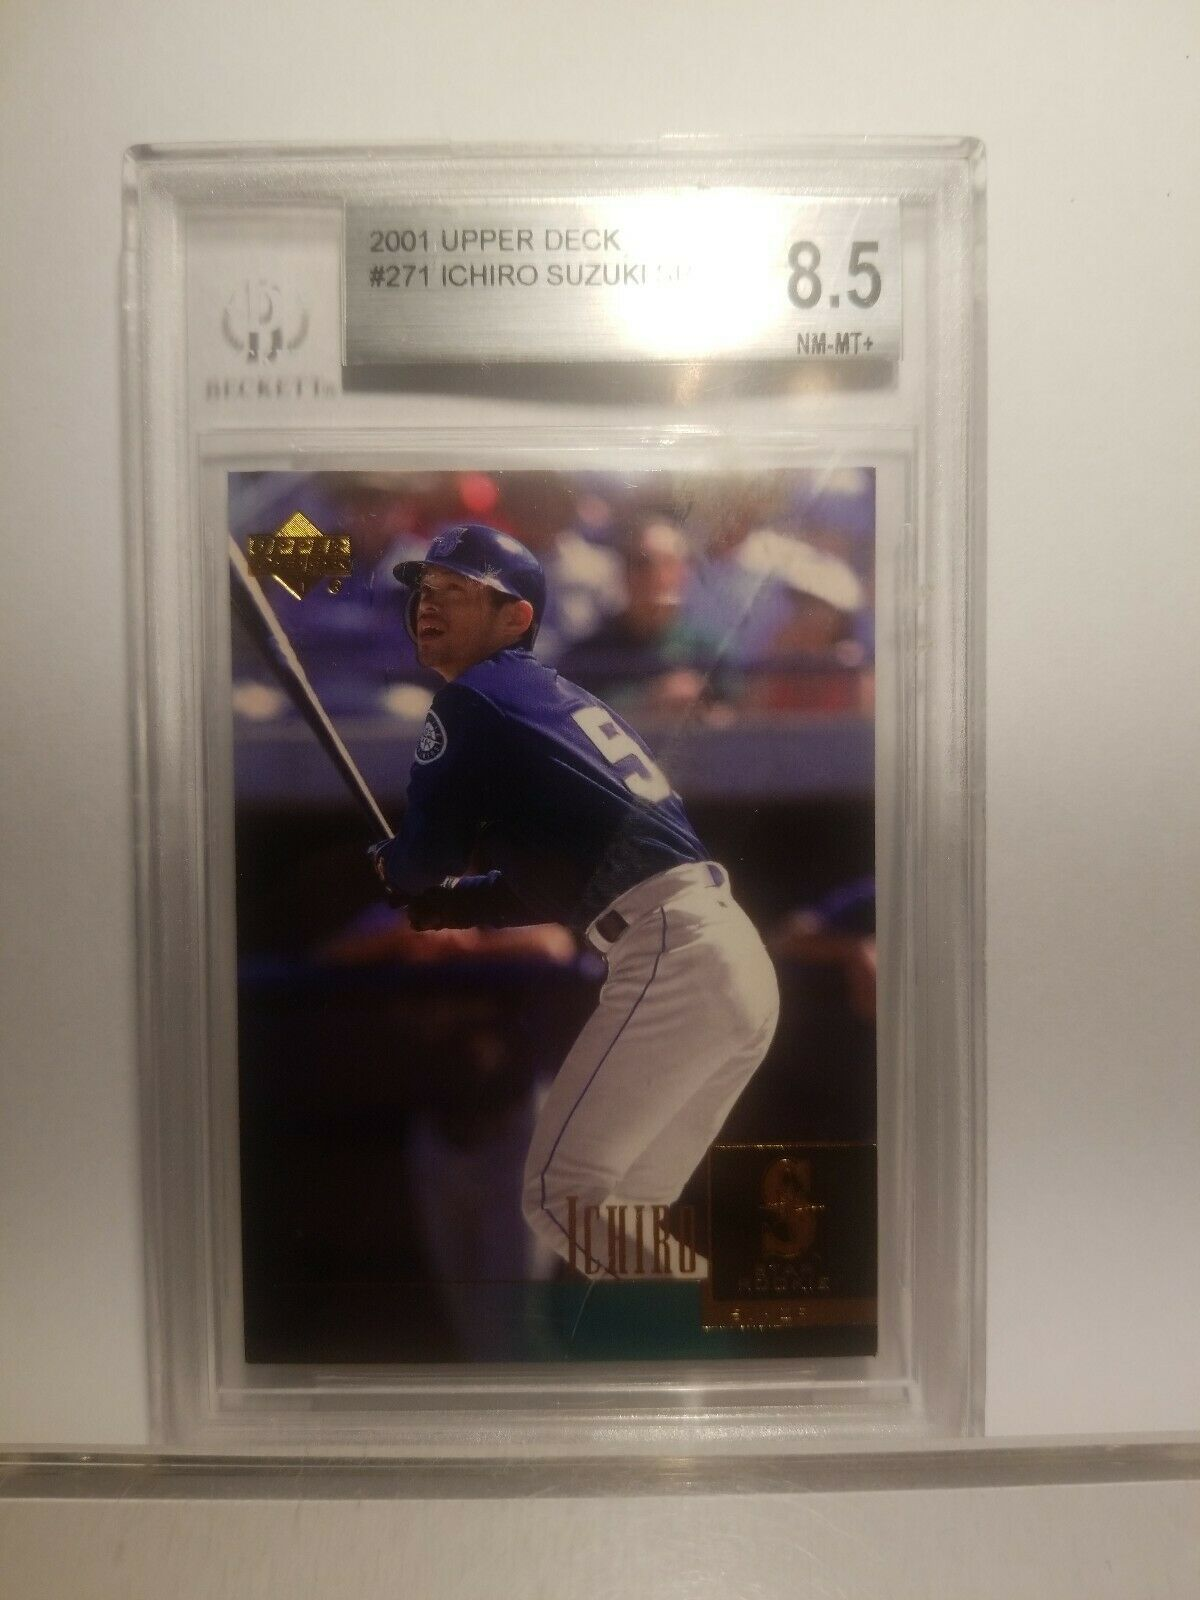 2001 Upper Deck #271 Ichiro Suzuki Seattle Mariners RC Rookie Baseball Card